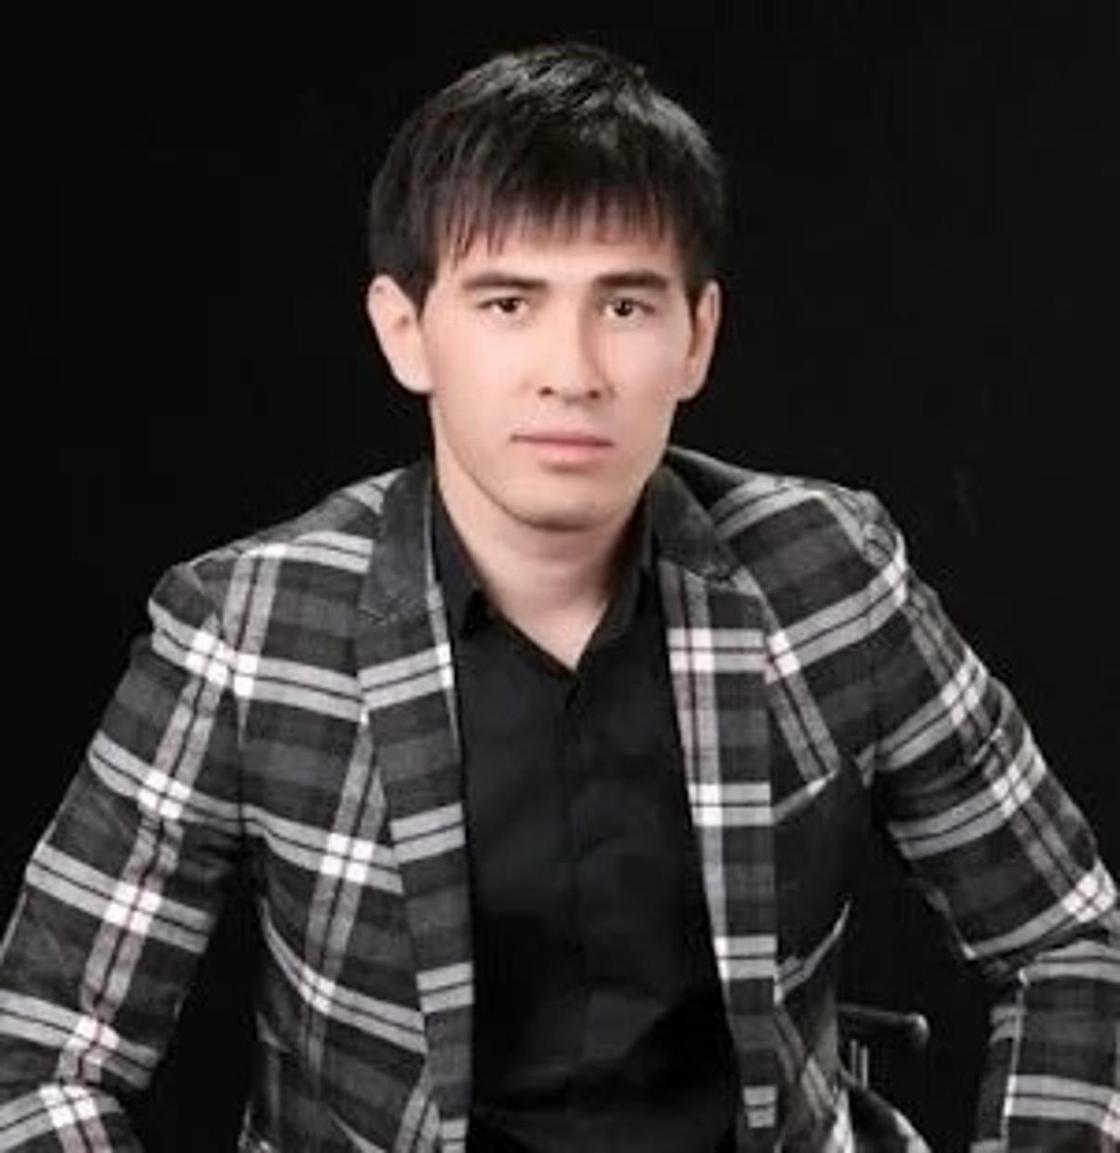 Асан Пердешов. Фото: downloadatoz.com